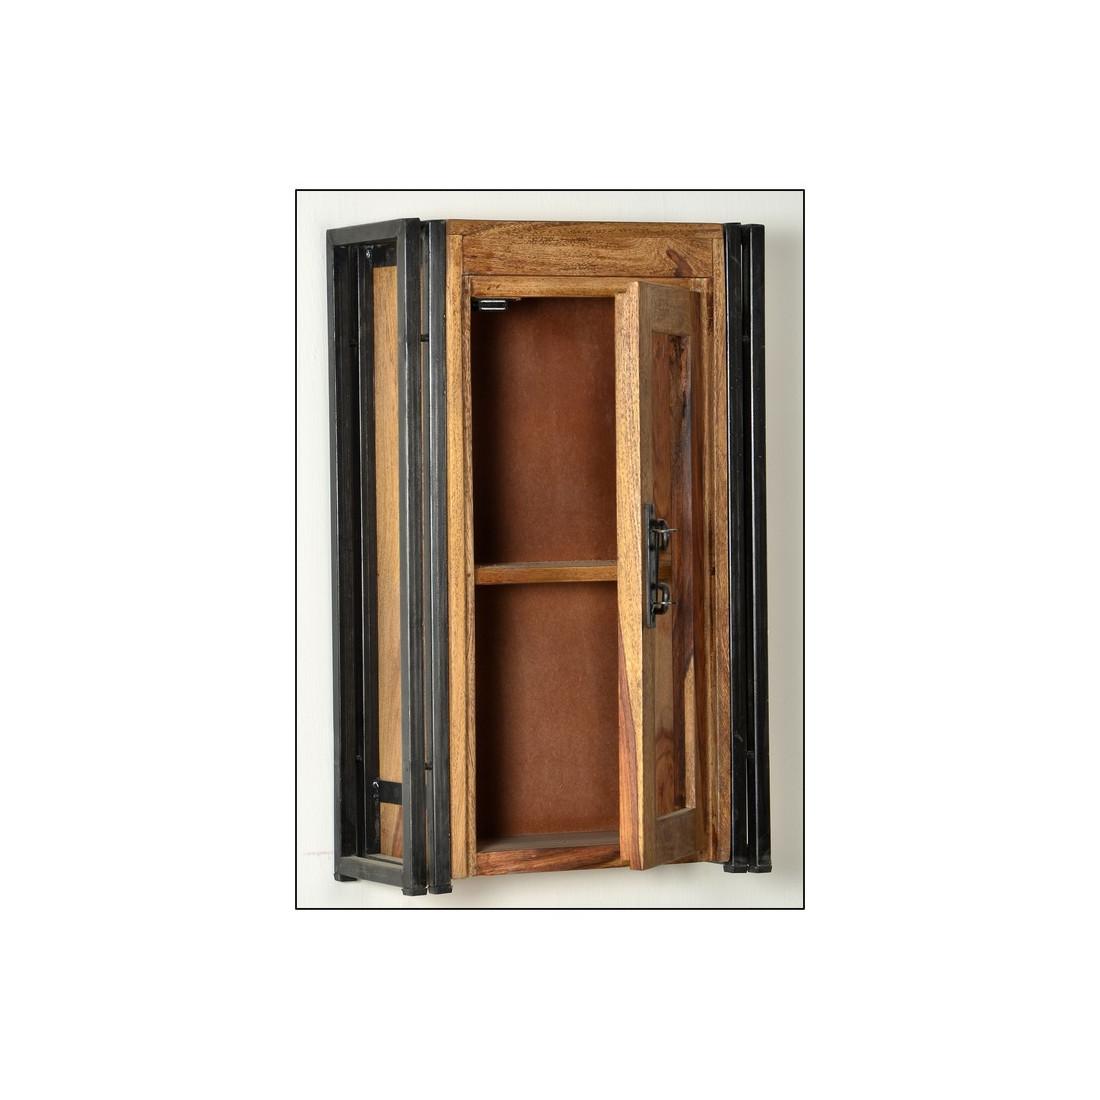 meuble suspendre 1 porte vitr e ipanema univers. Black Bedroom Furniture Sets. Home Design Ideas